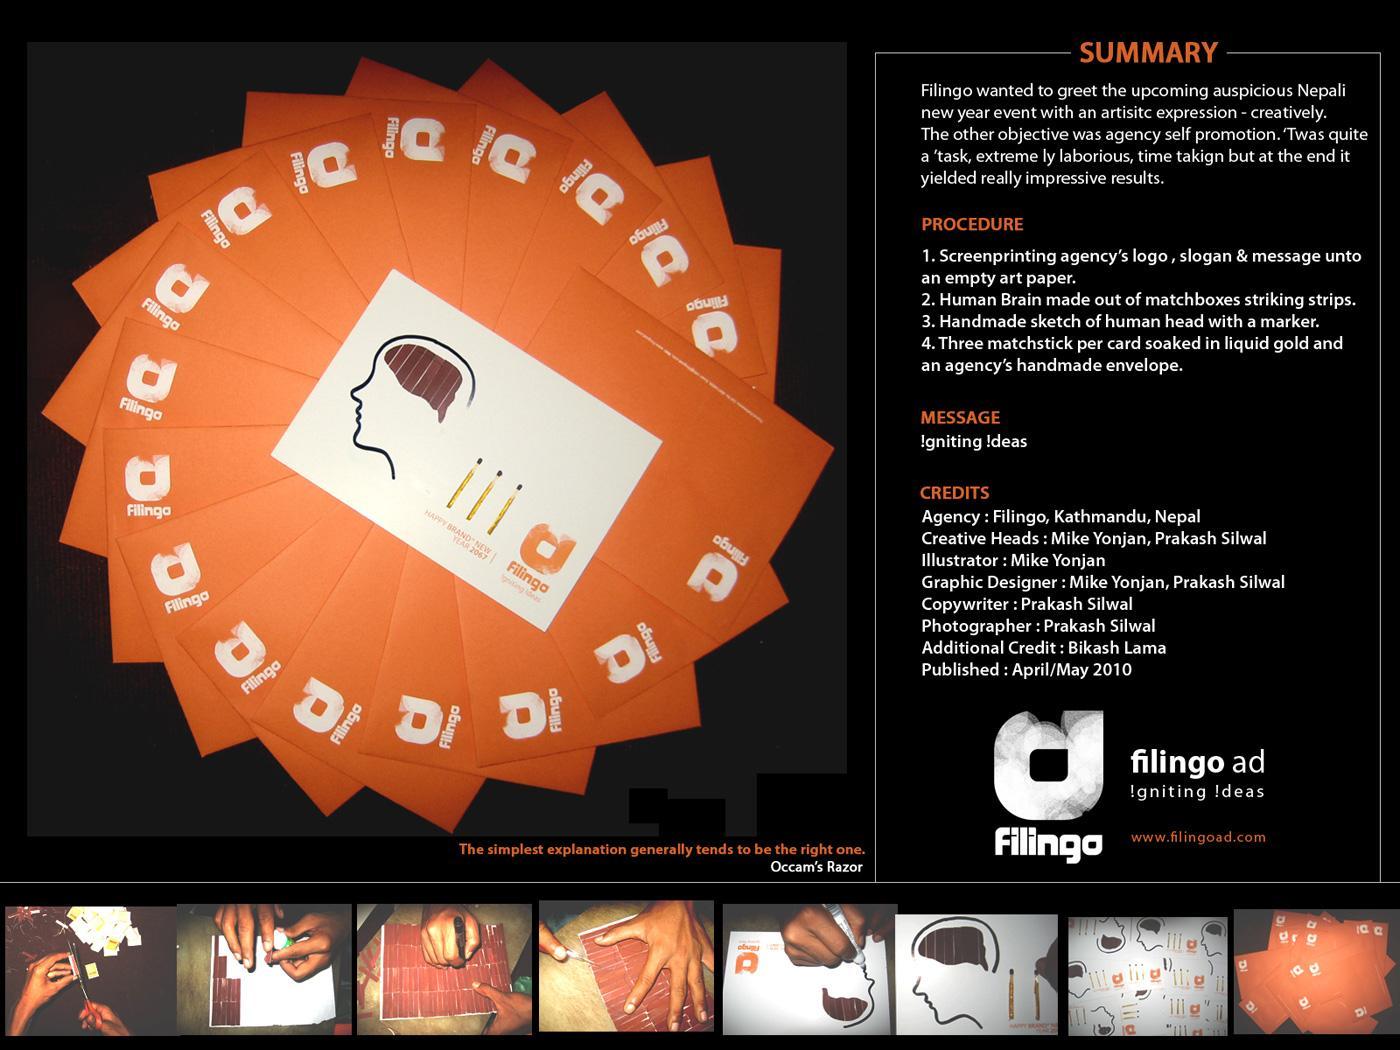 Filingo Ambient Ad -  Igniting ideas